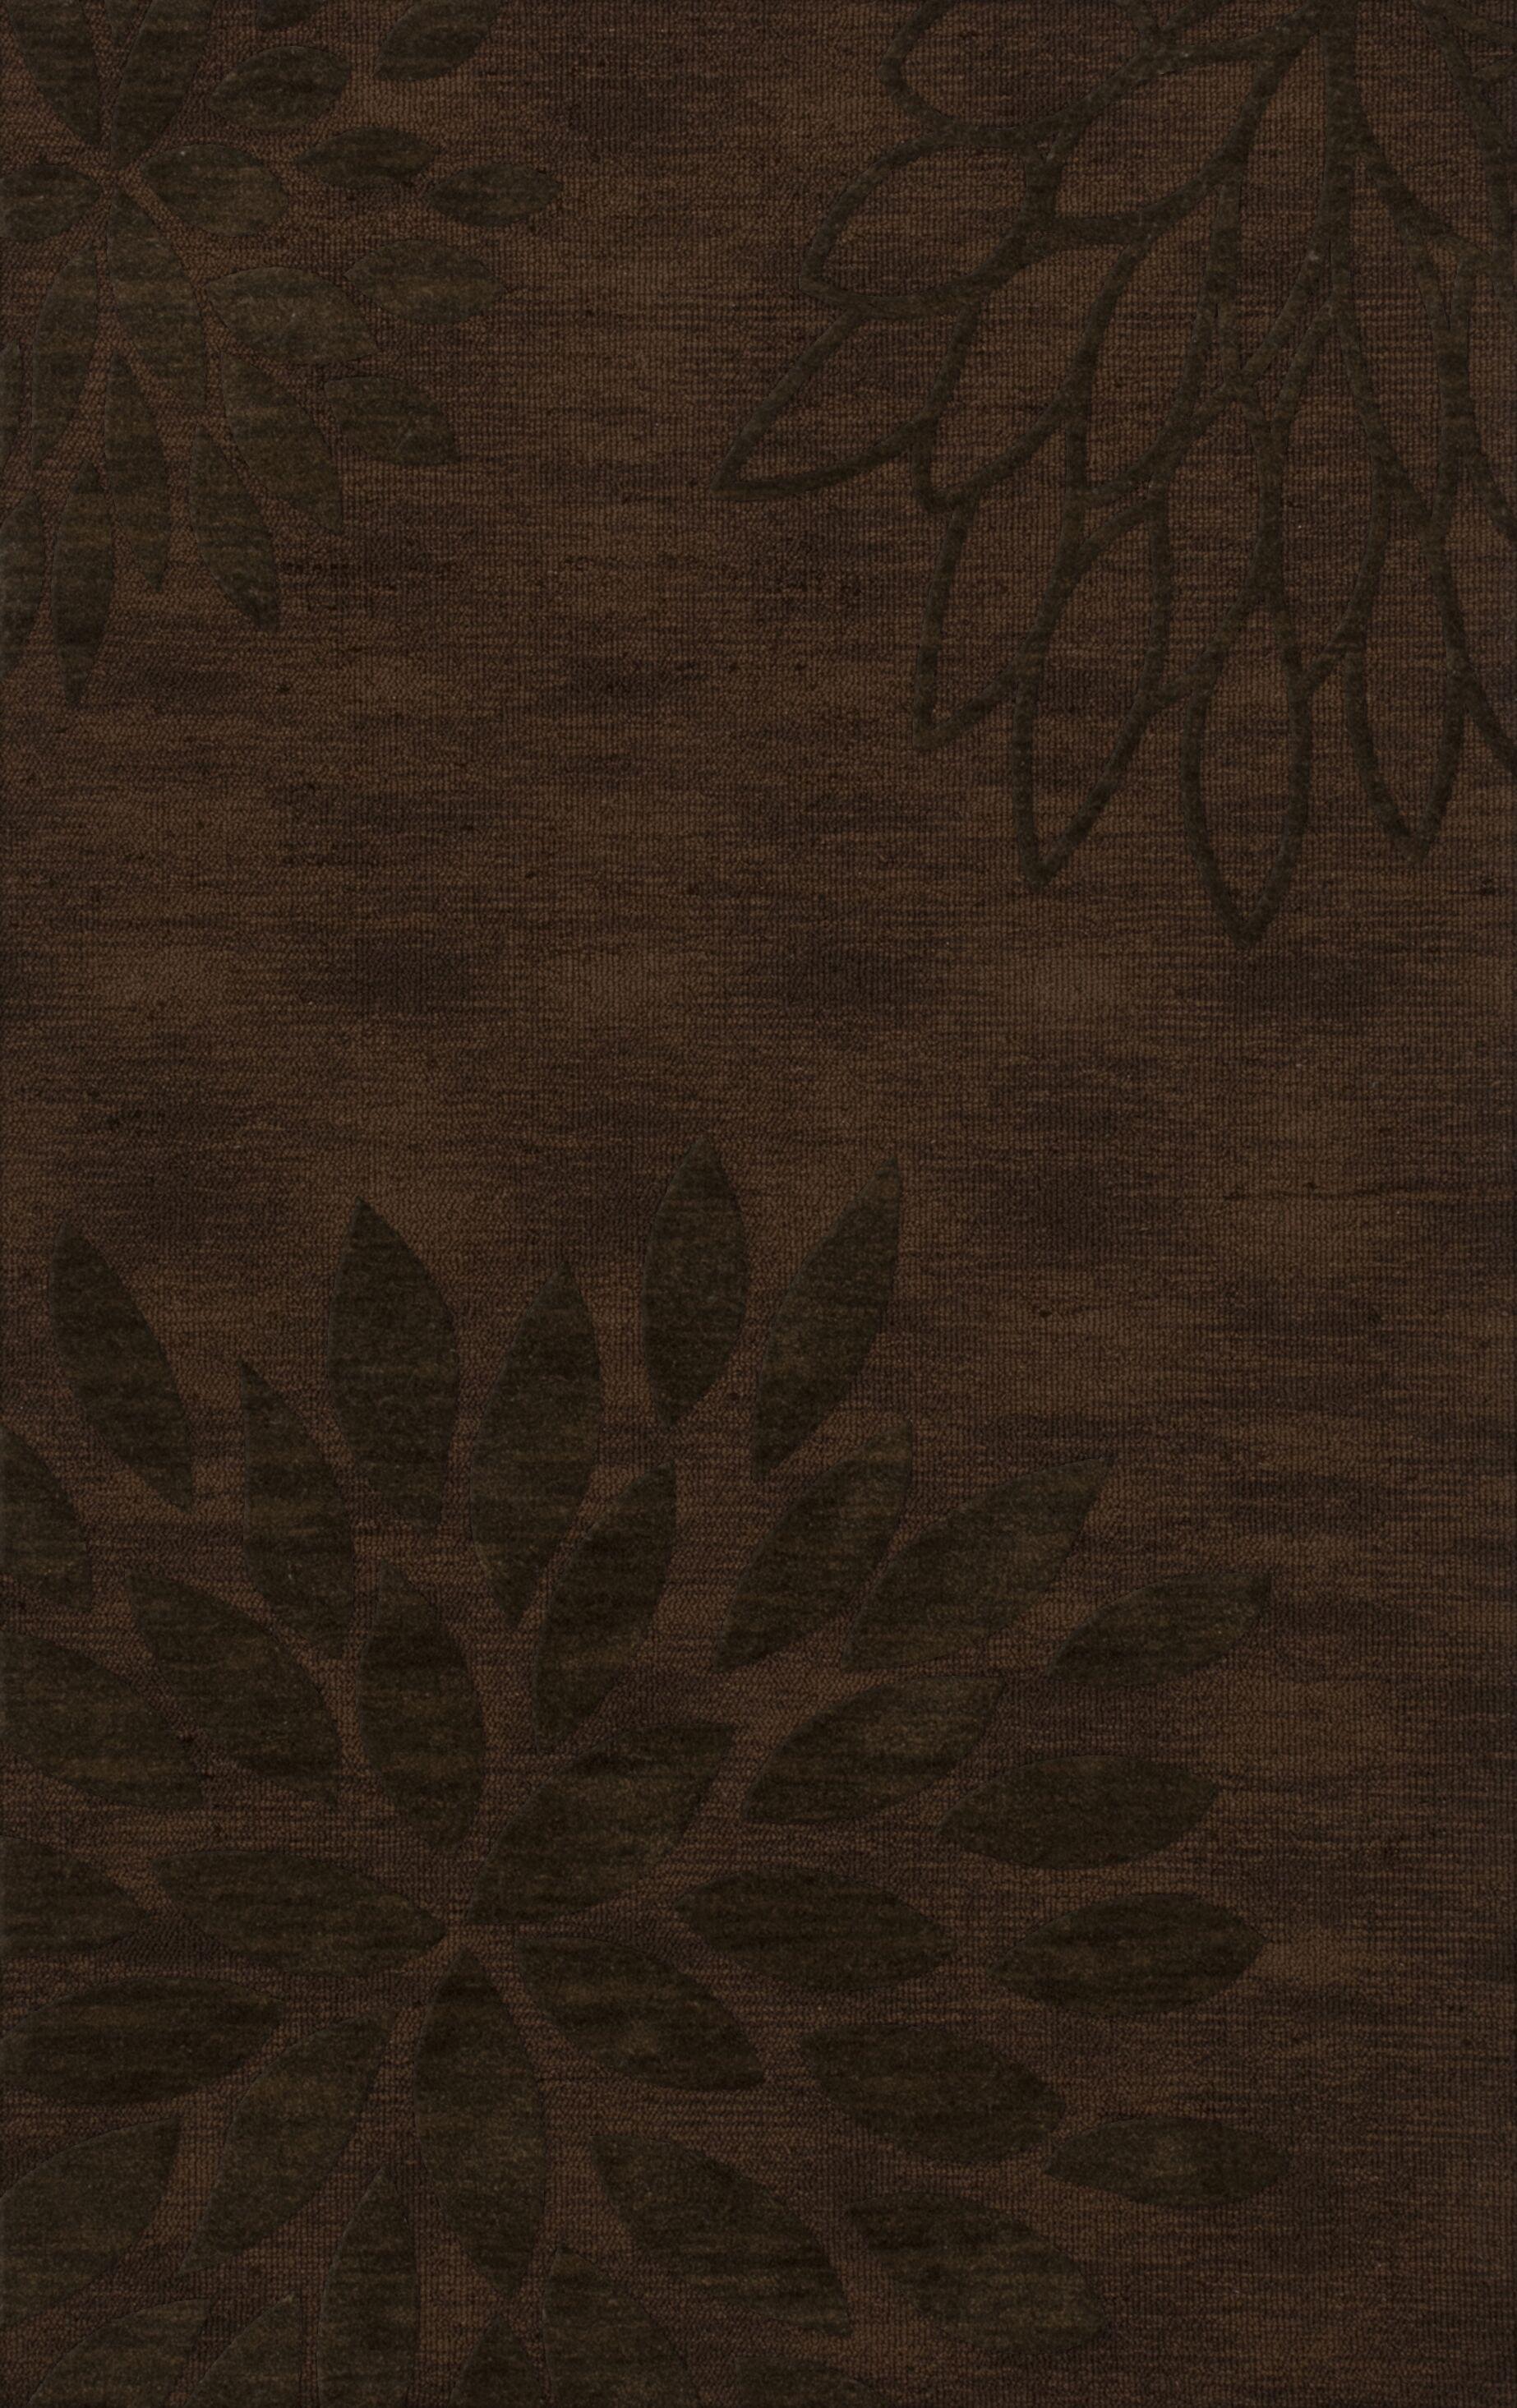 Bao Fudge Area Rug Rug Size: Rectangle 12' x 15'